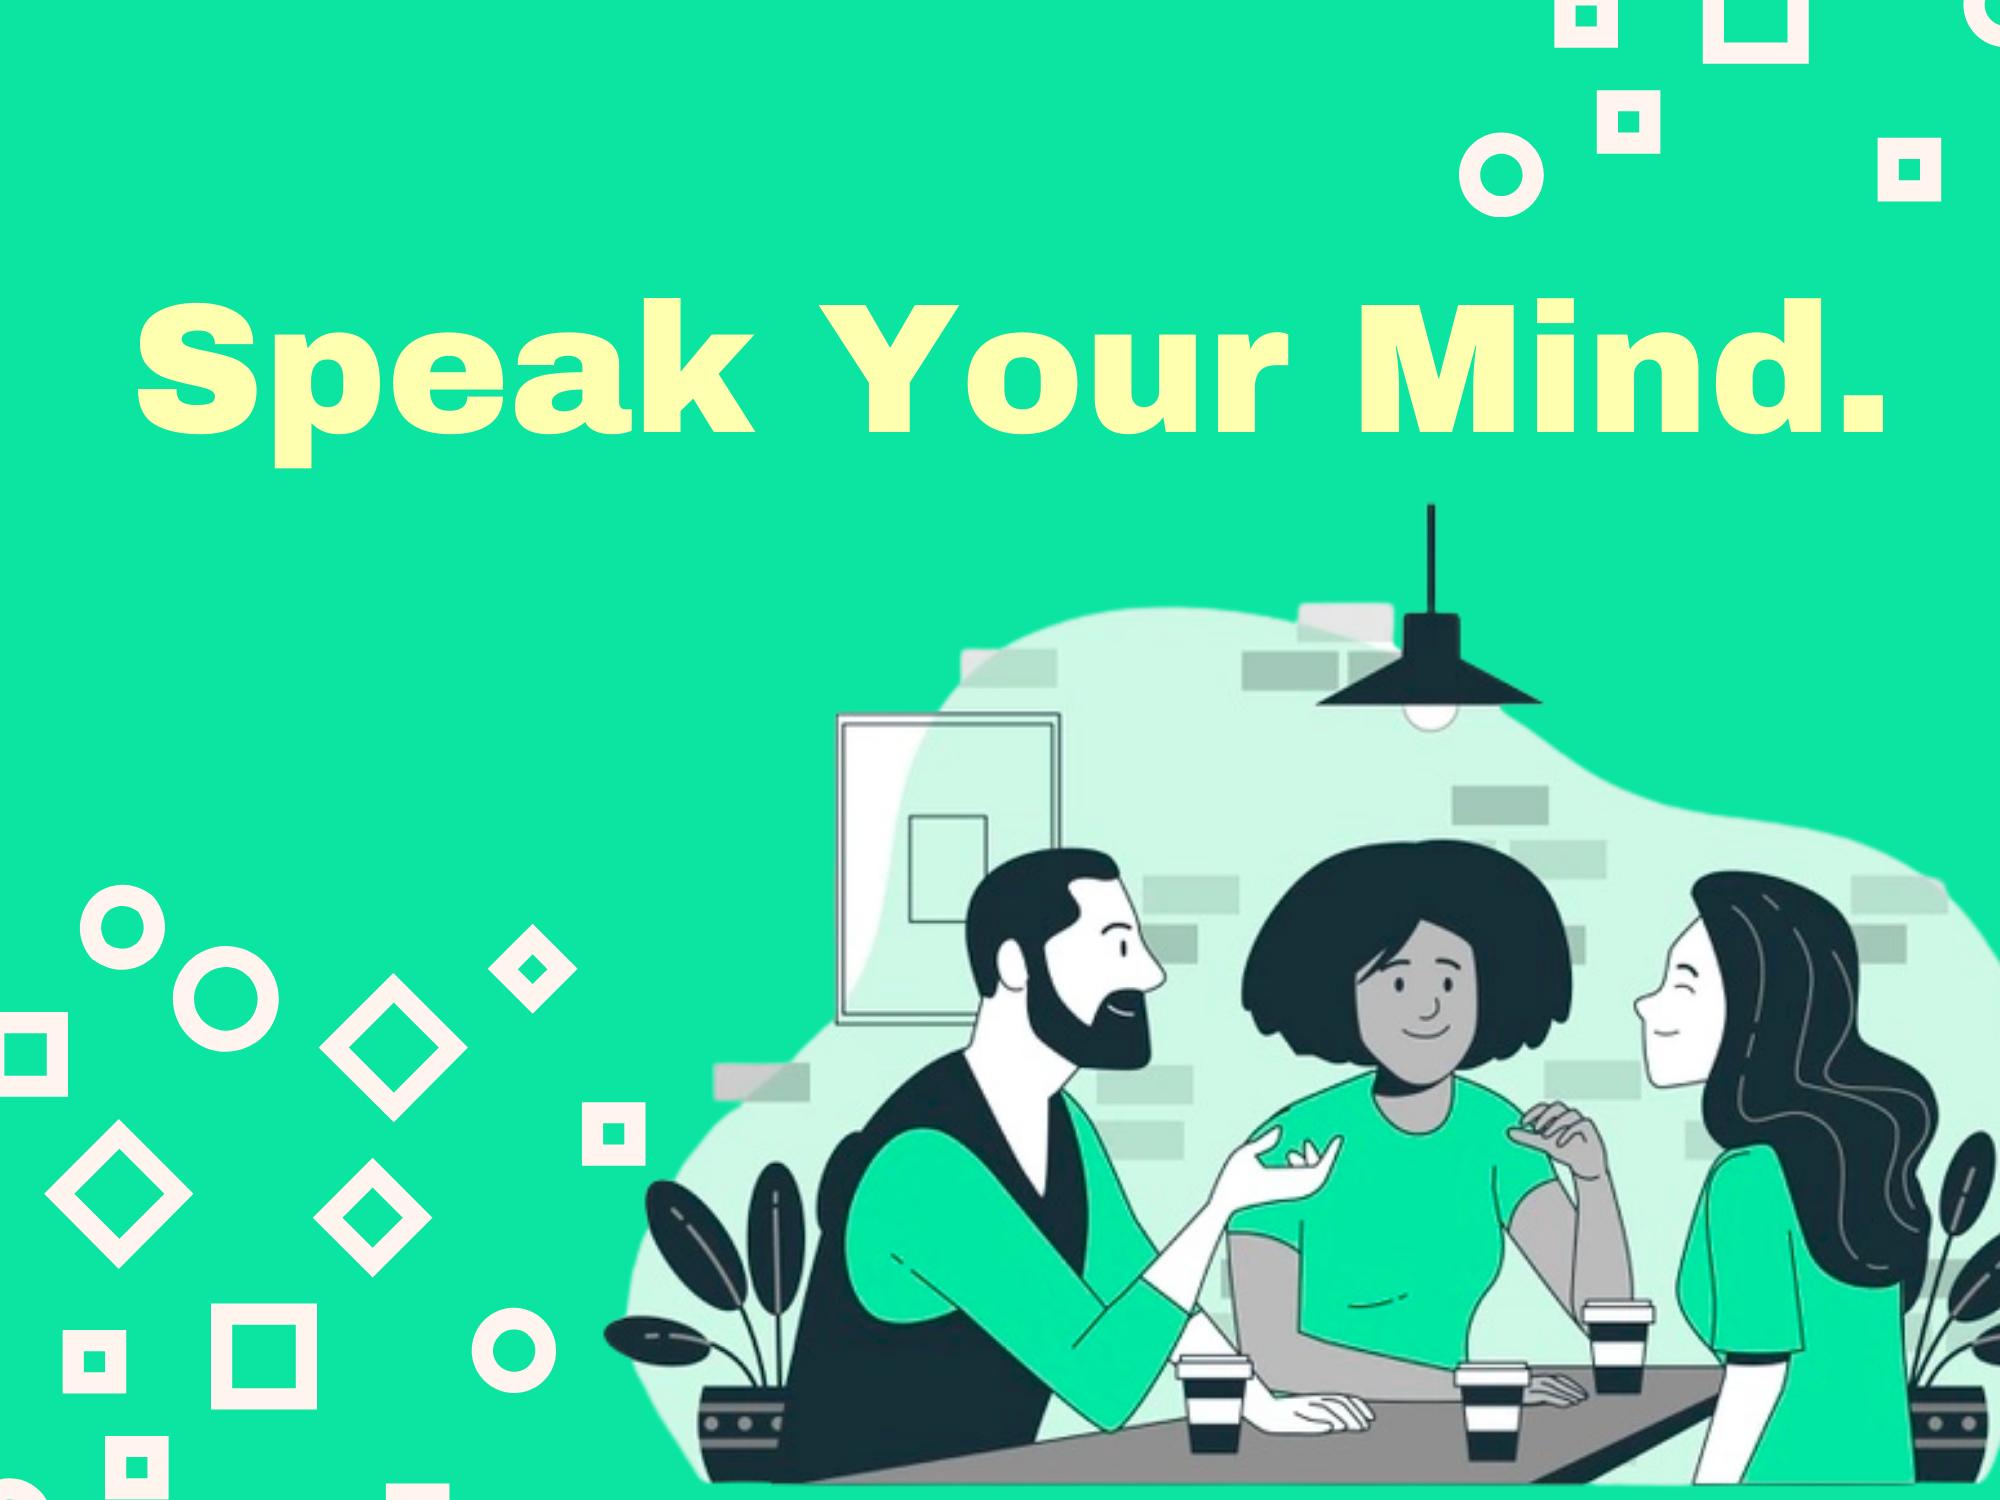 Speak-Your-Mind